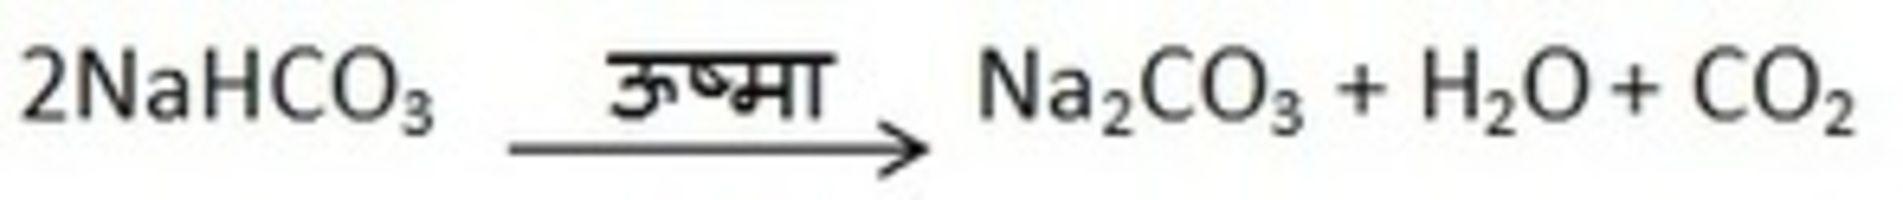 Na2co3 Acid Or Base